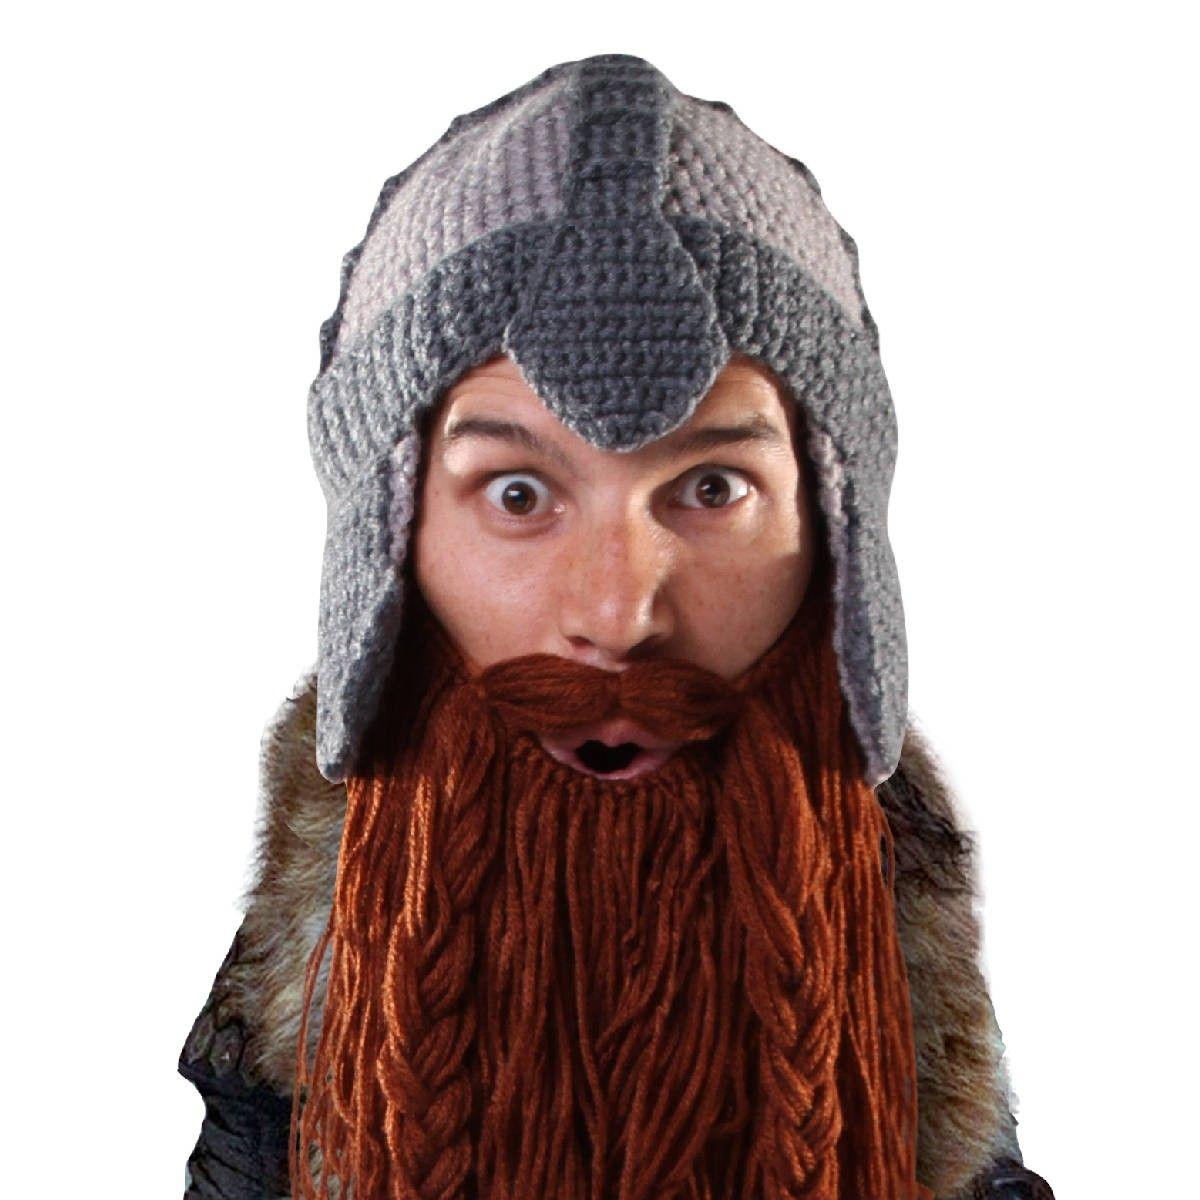 f721655e4 Barbarian Warrior Beard Head knit hat with beard! Looks like ...